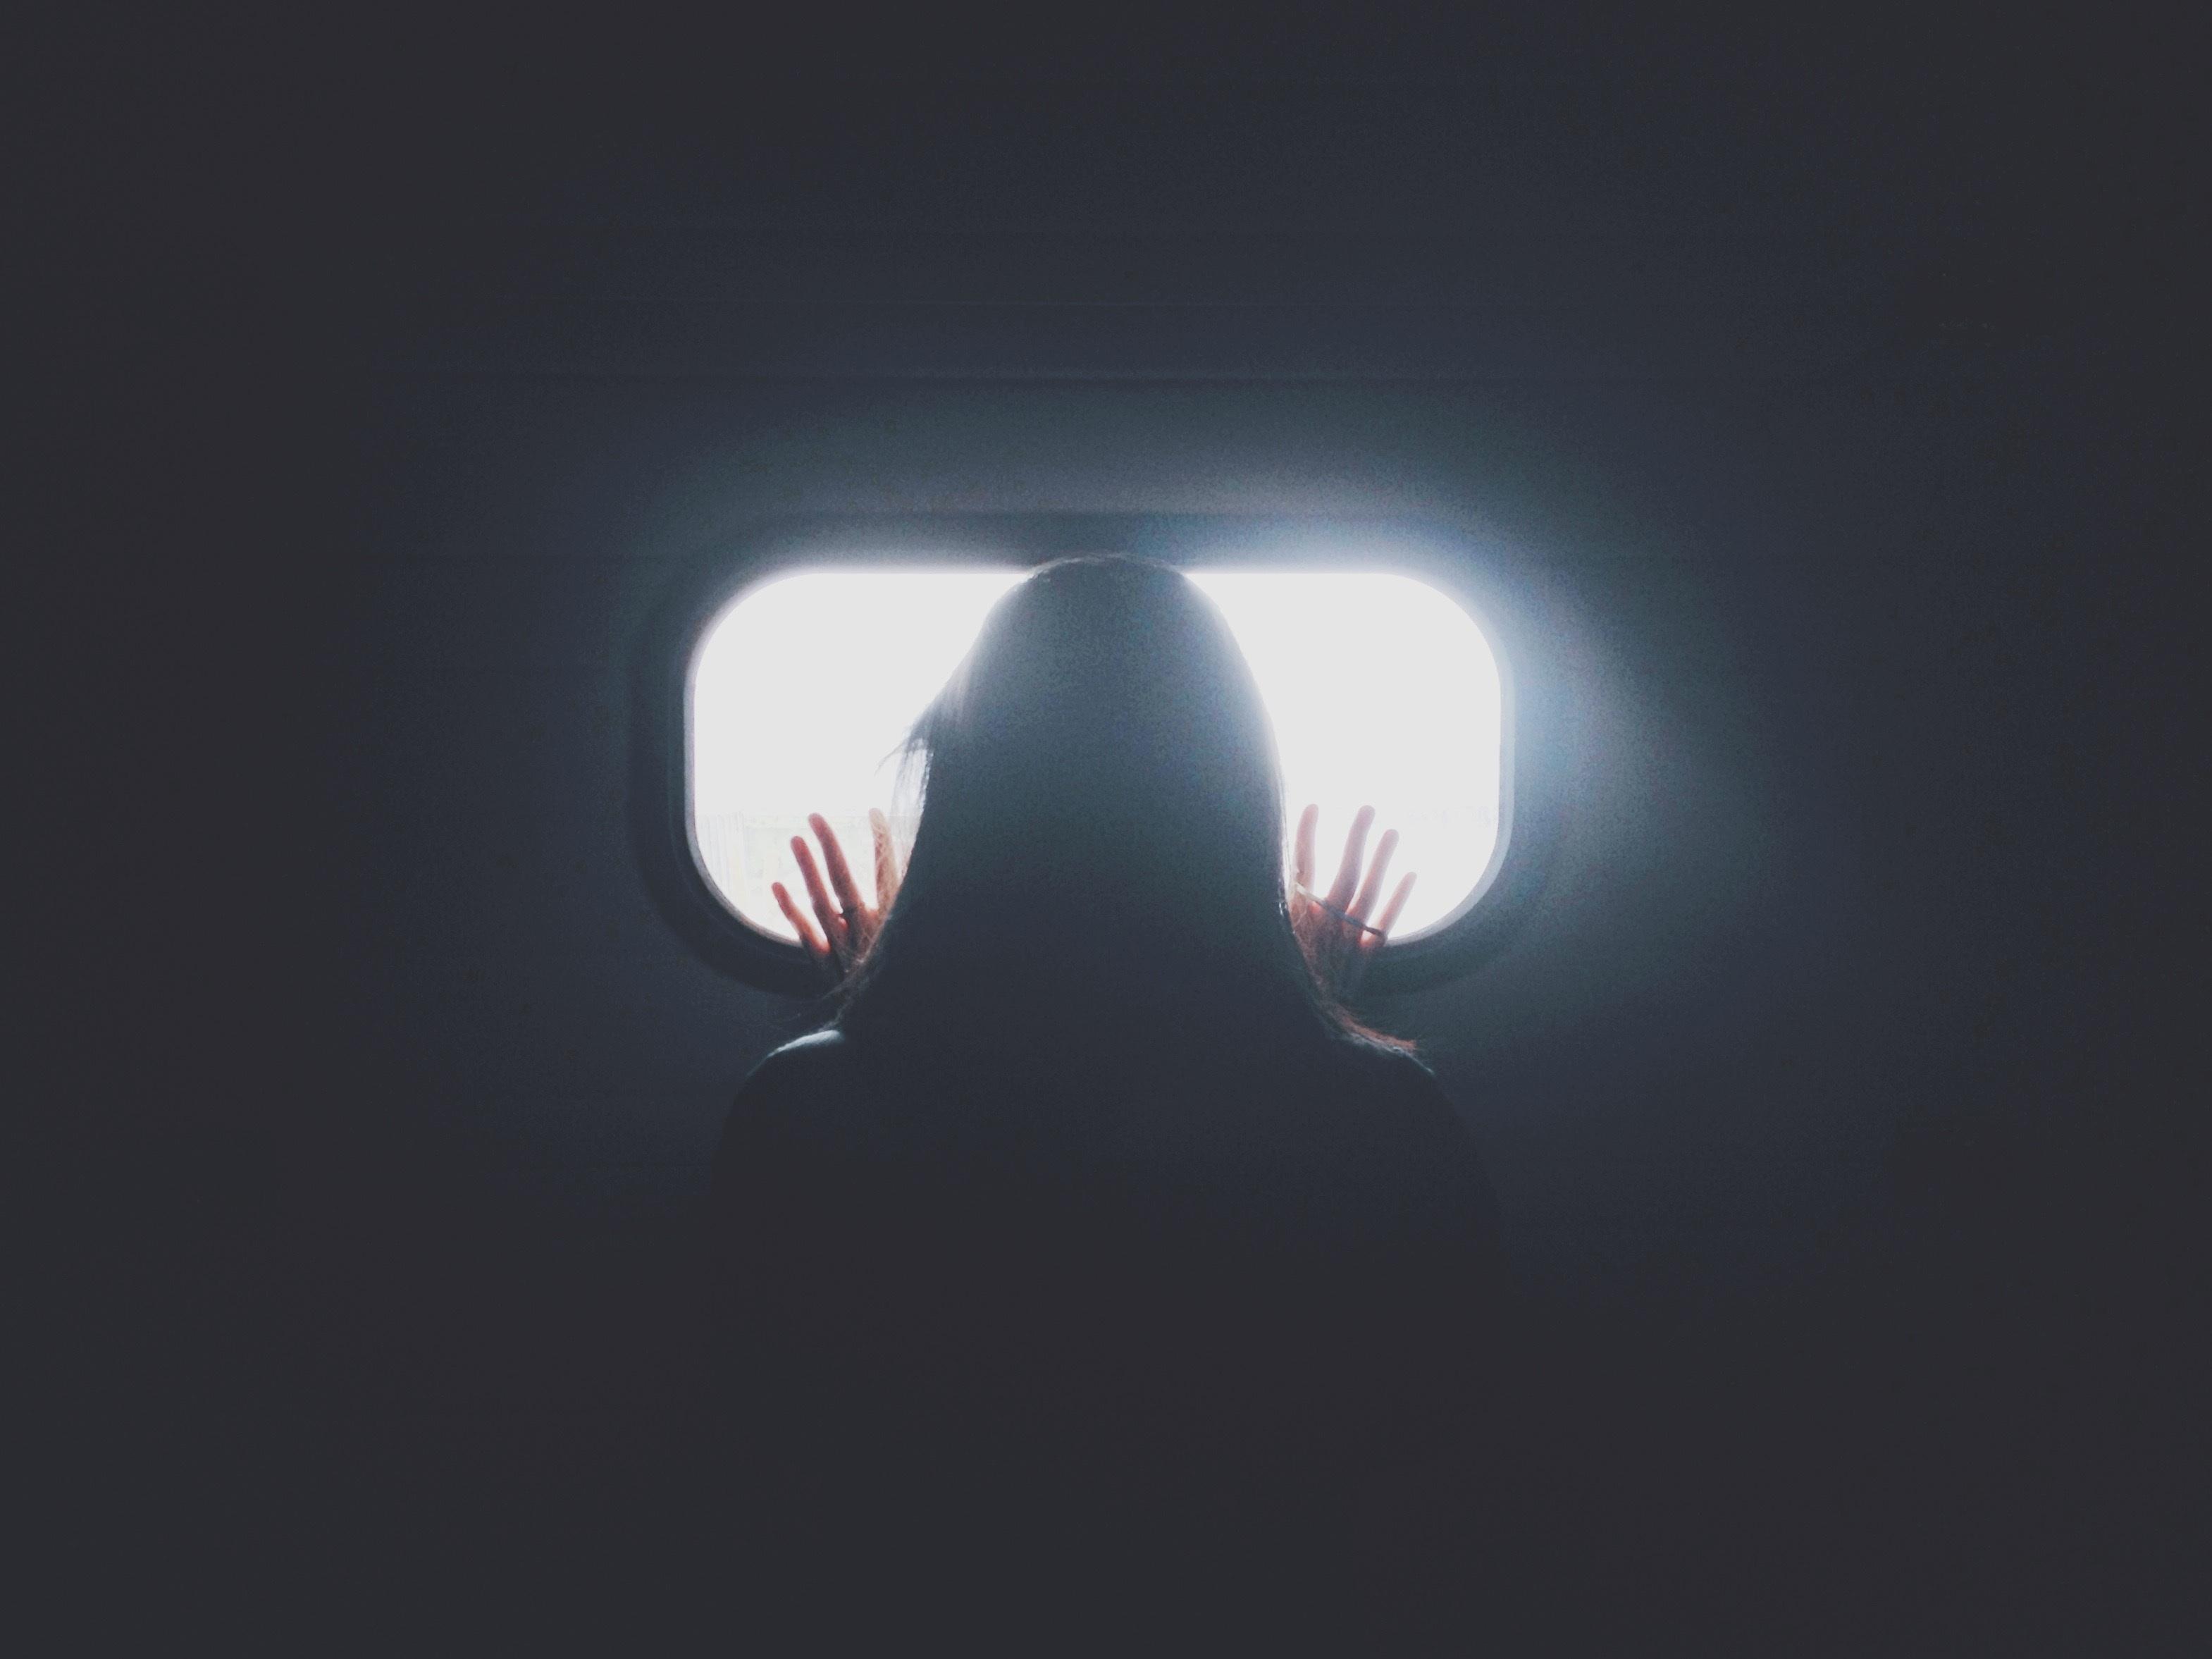 Realidad objetiva y realidad subjetiva